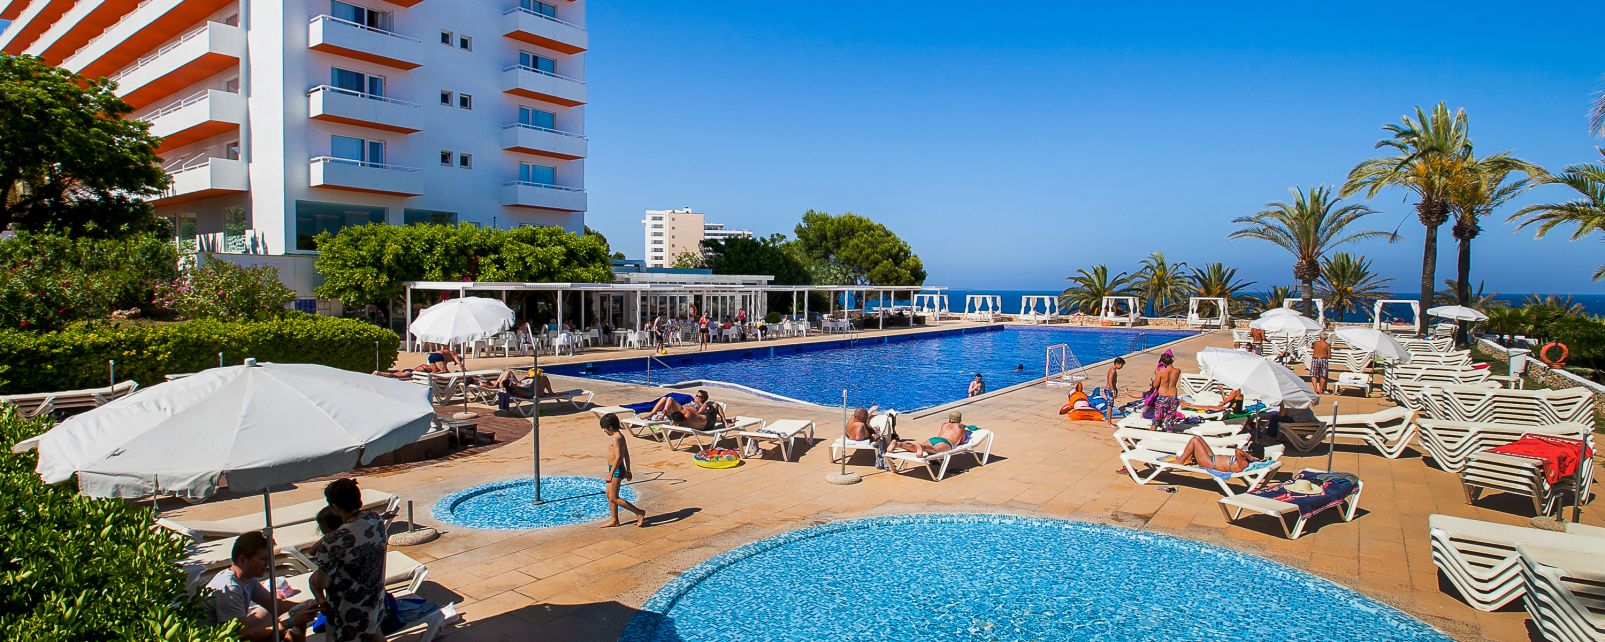 Palia Maria Eugenia Hotel In Calas De Mallorca